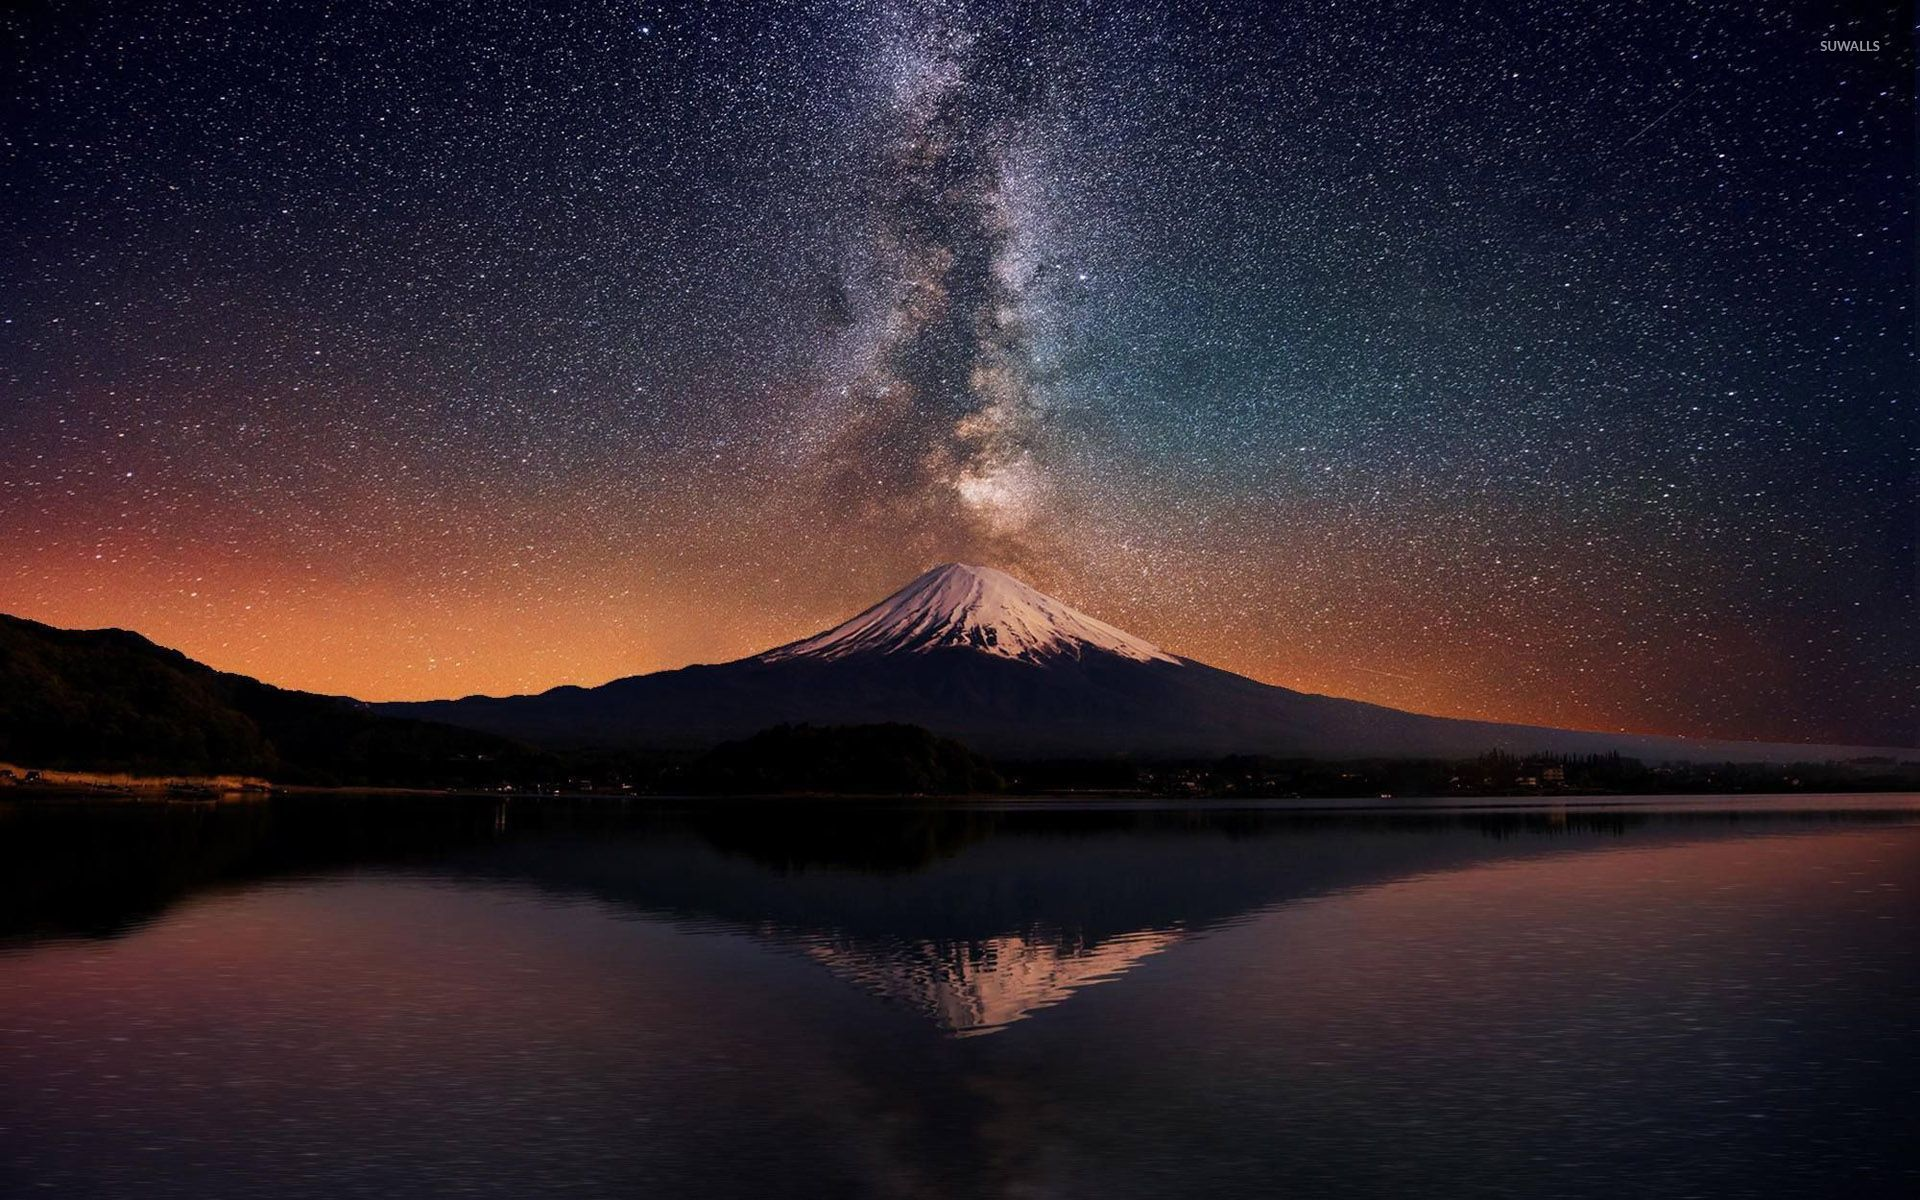 Mount Fuji Wallpaper Nature Wallpapers 26726